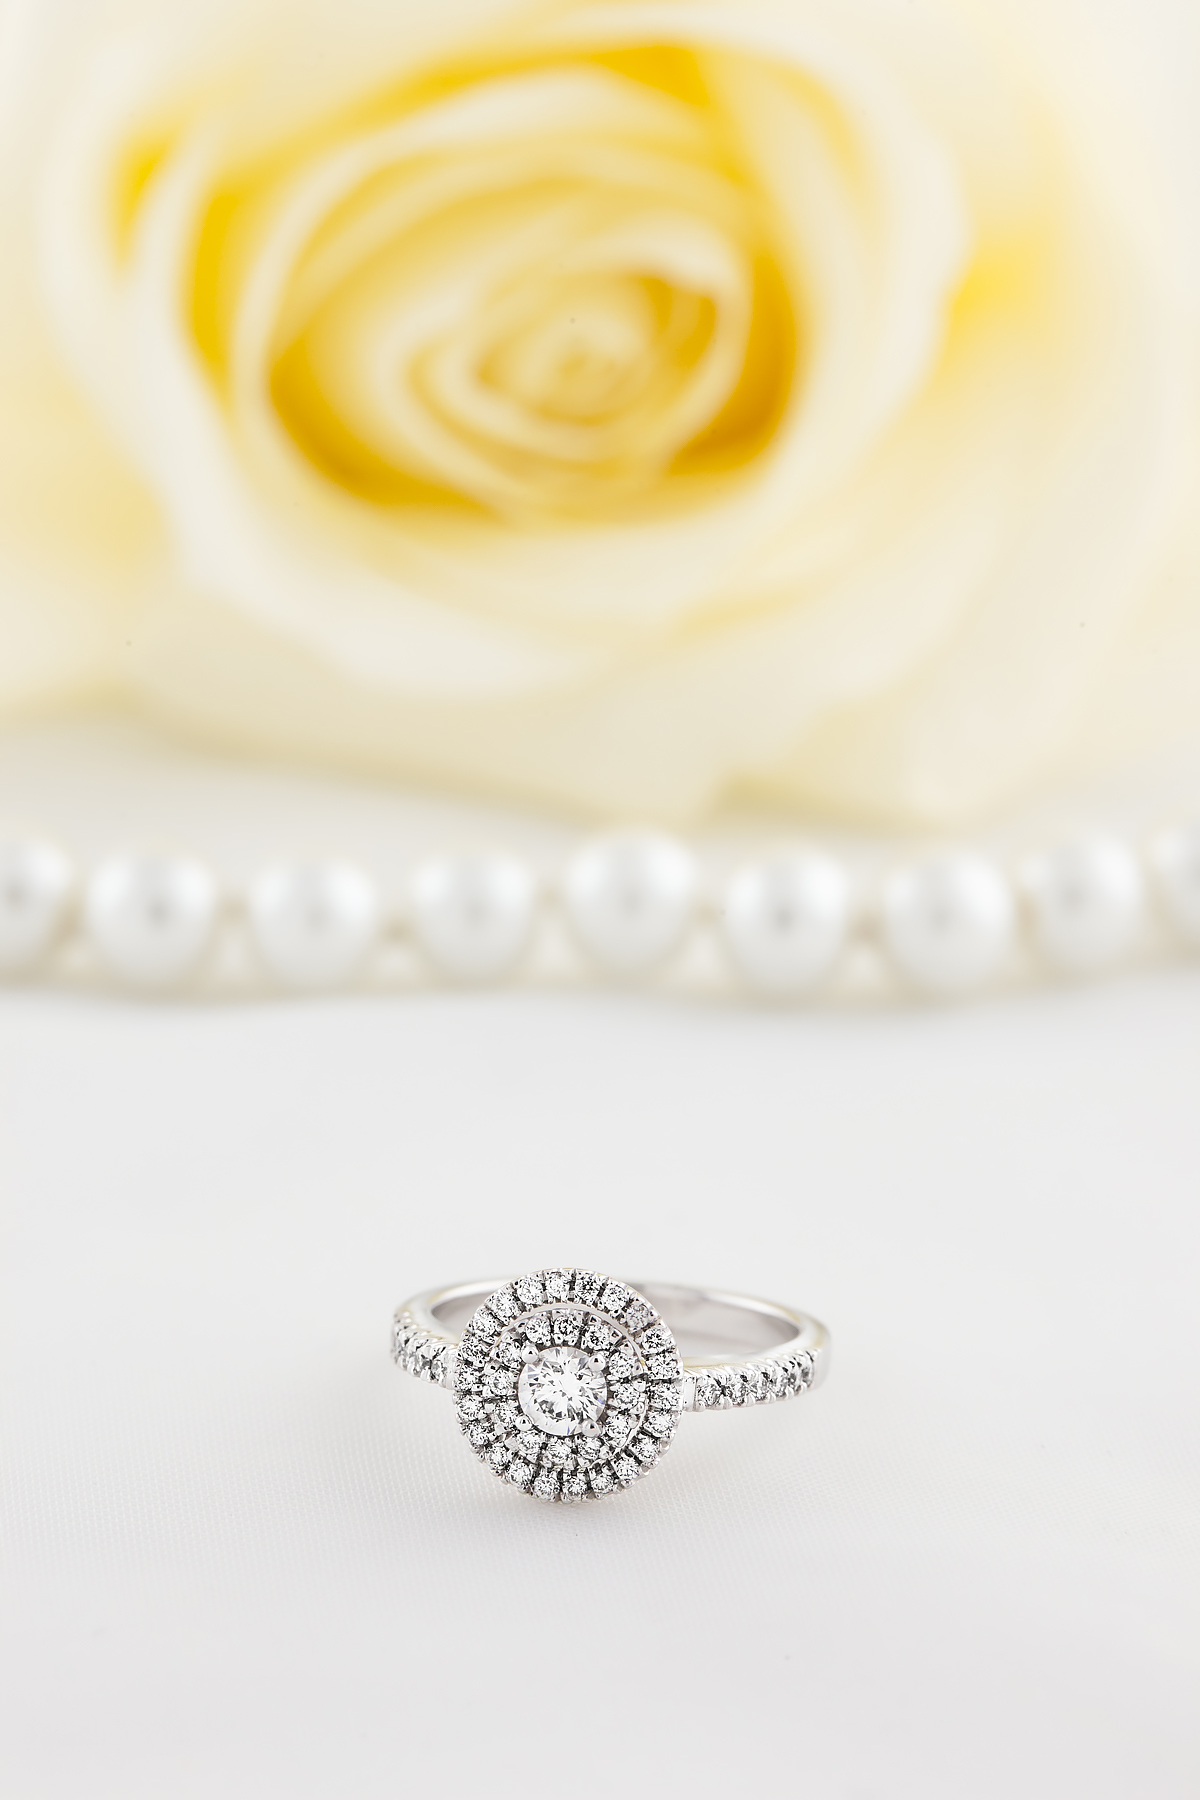 Inel Cocktail/ Inel de Logodna cu Diamante Dama Aur Alb 18kt cu Diamante Rotund Briliant Setate cu Gheare, Stil Dublu Halo-img1